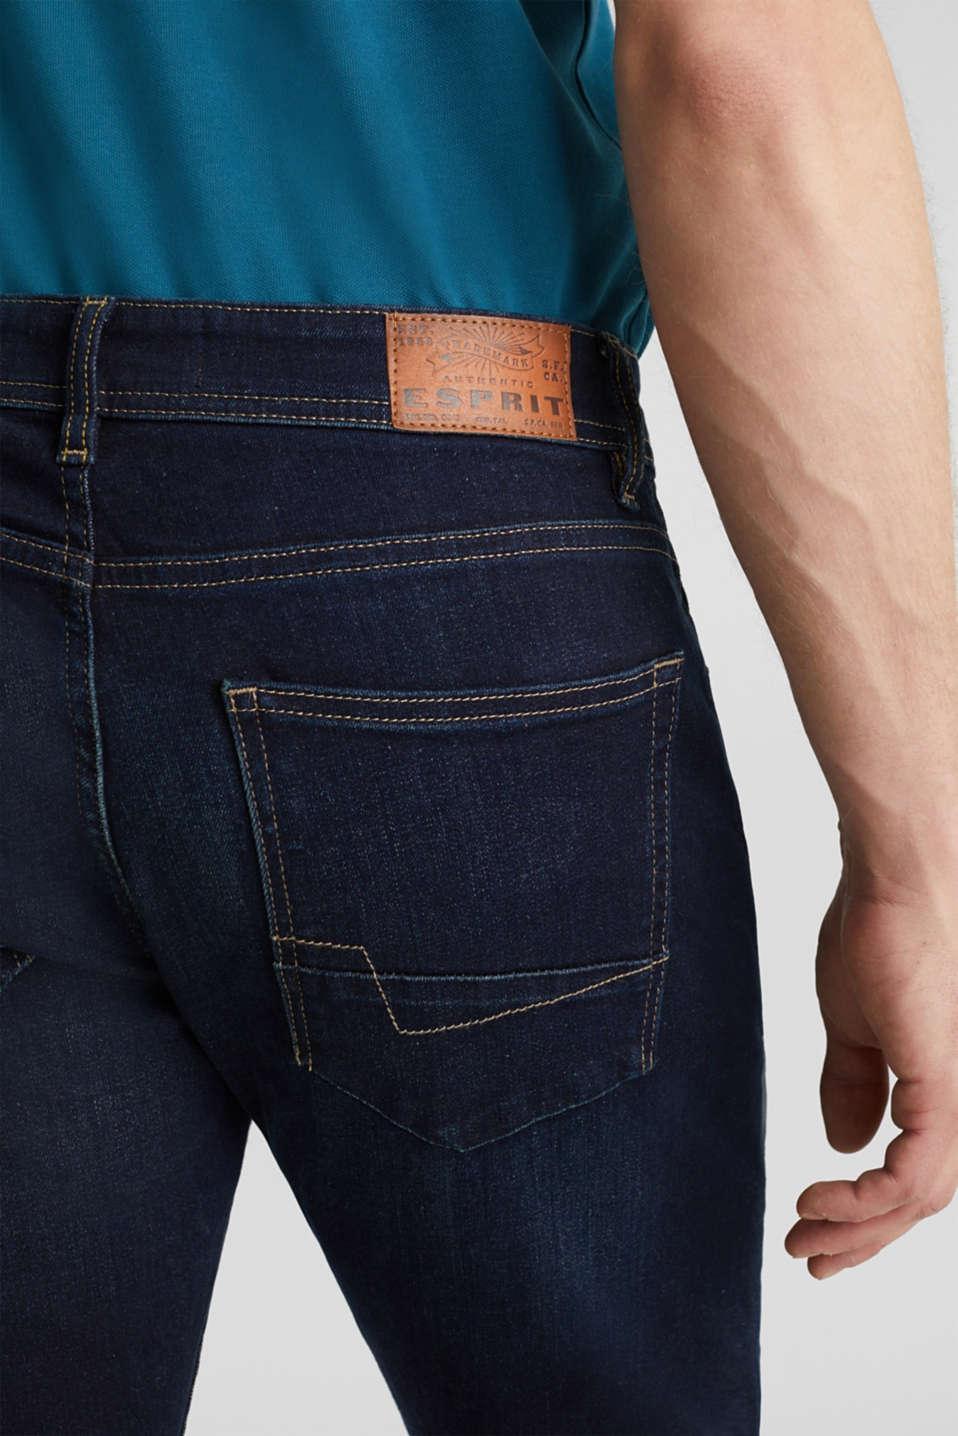 Pants denim Straight fit, BLUE DARK WASH, detail image number 3